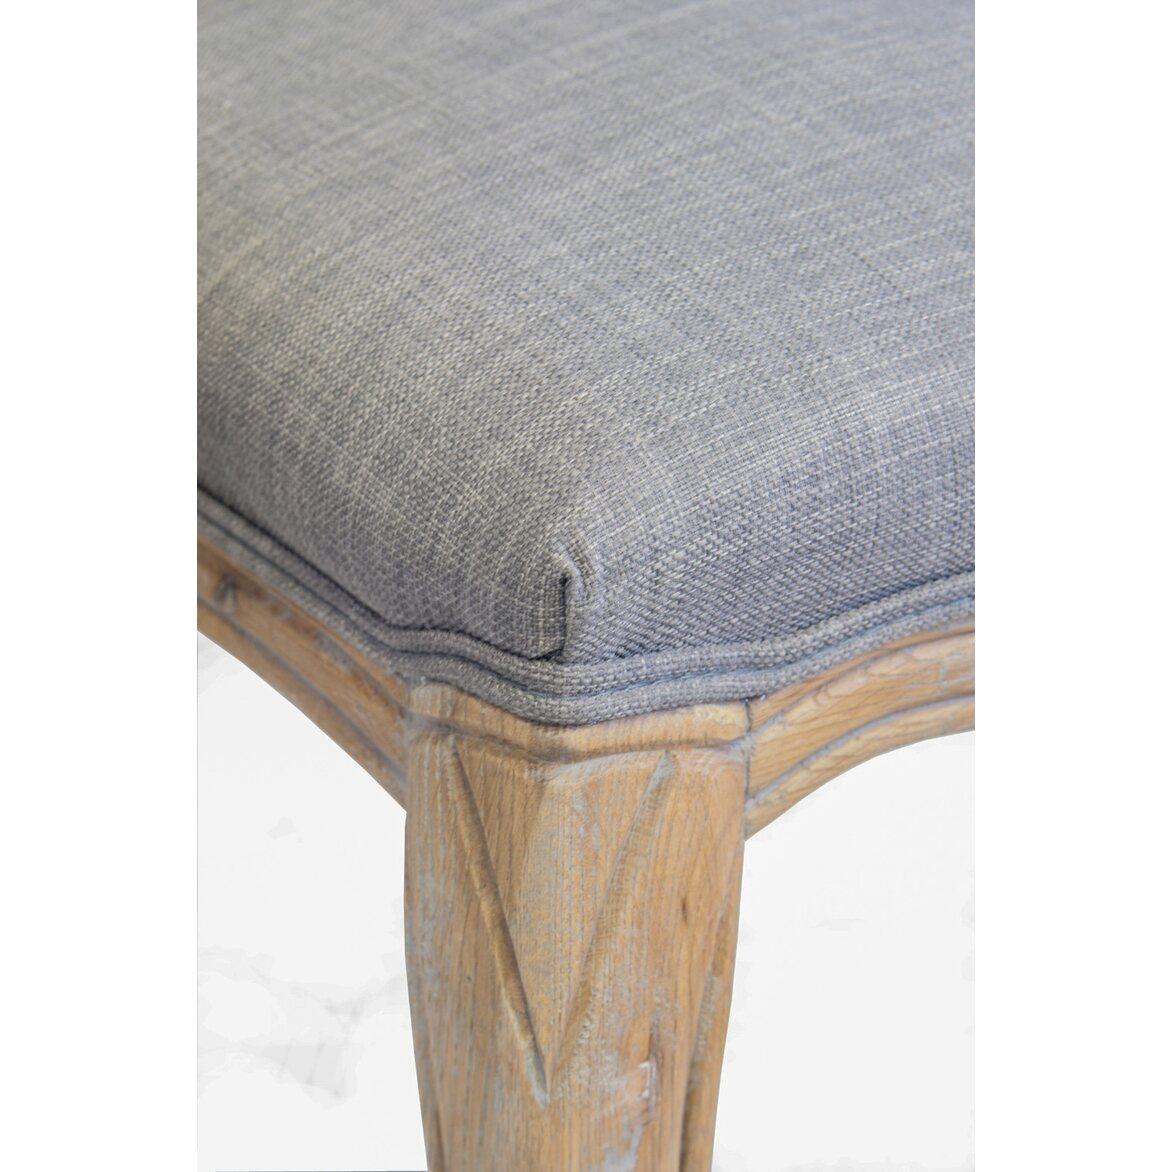 Стул Granes grey 5 | Обеденные стулья Kingsby